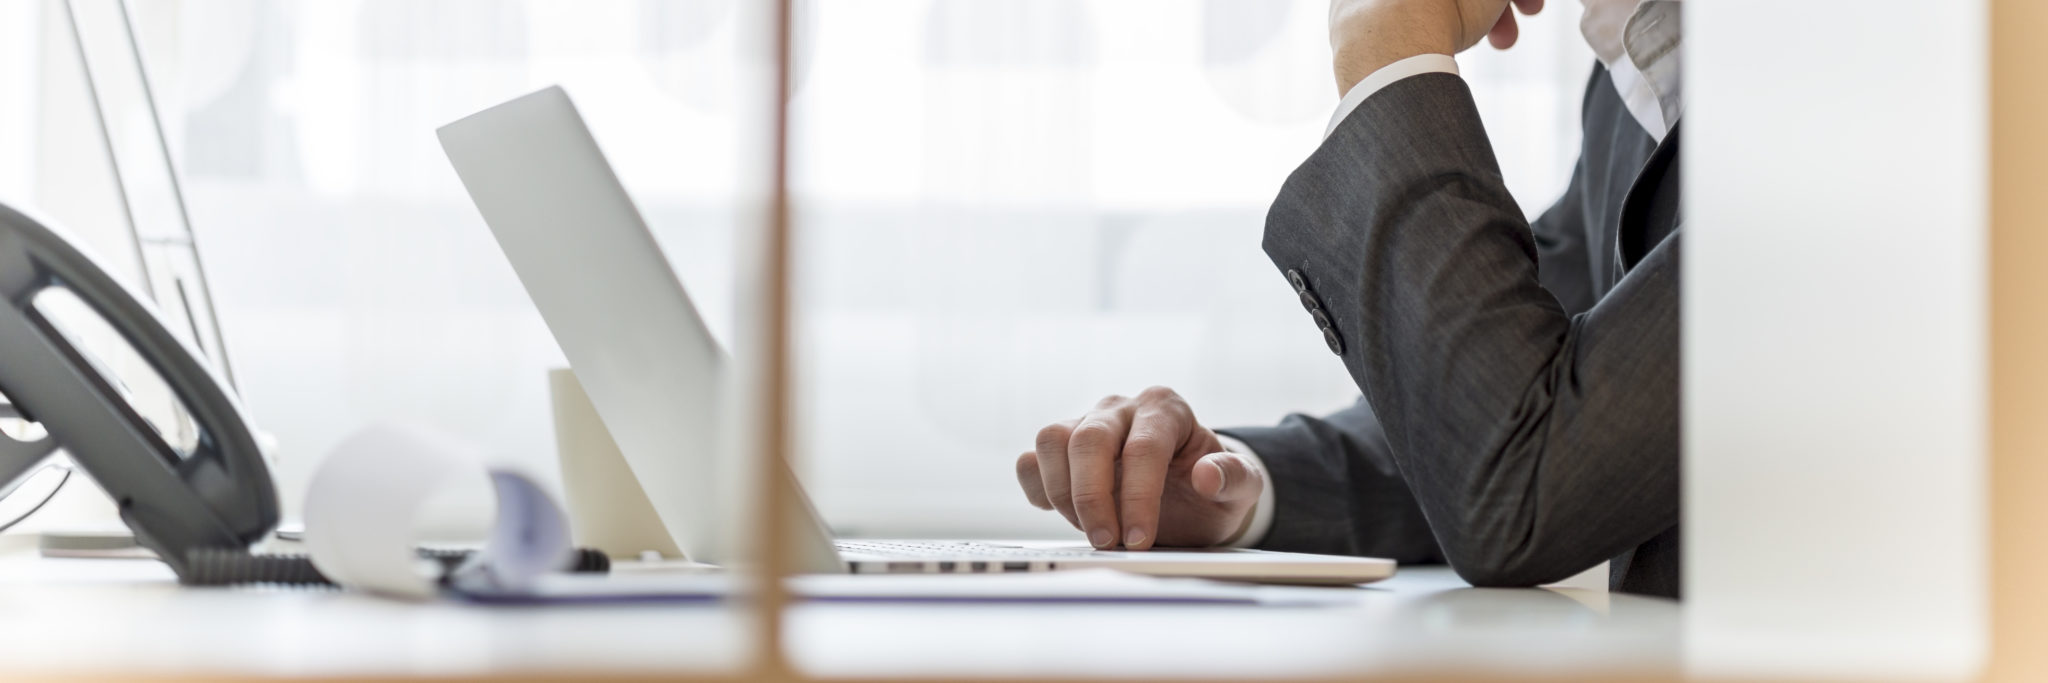 2019 Best Online Professional Networking Platforms